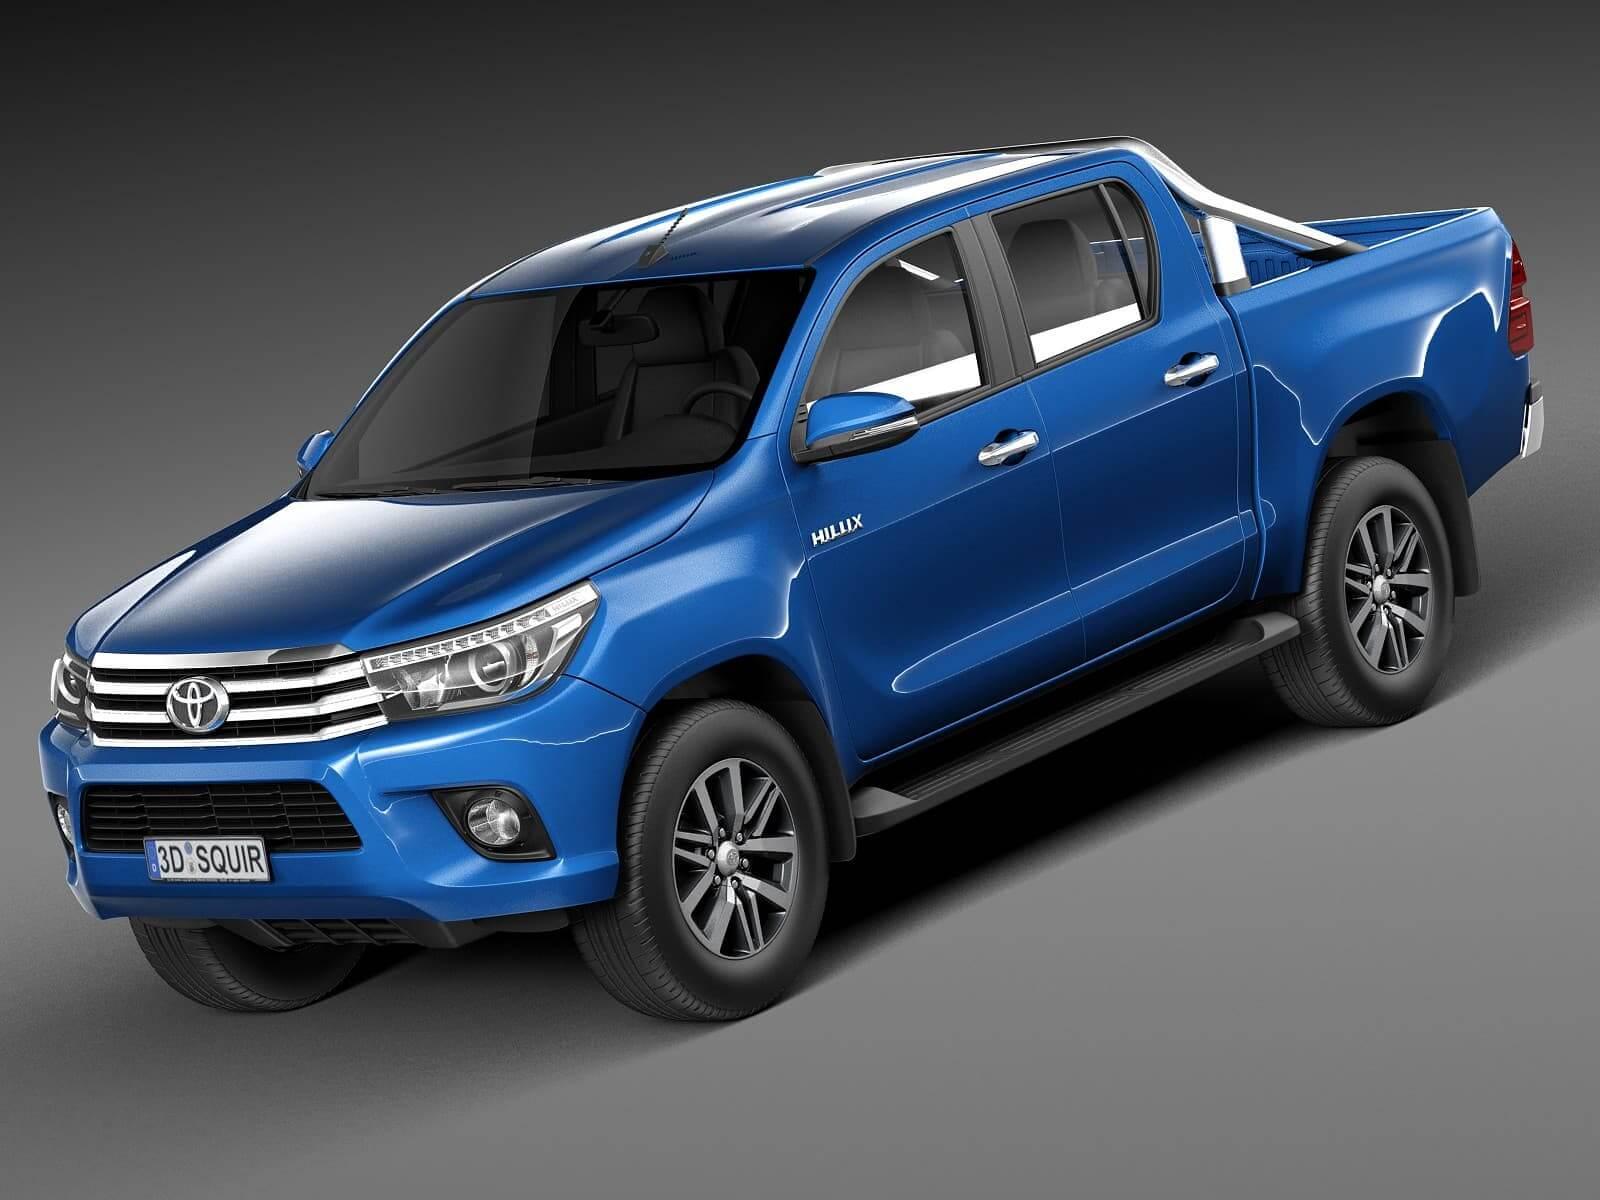 Toyota 2016 Models >> Toyota Hilux Double Cab 2016 3d Model